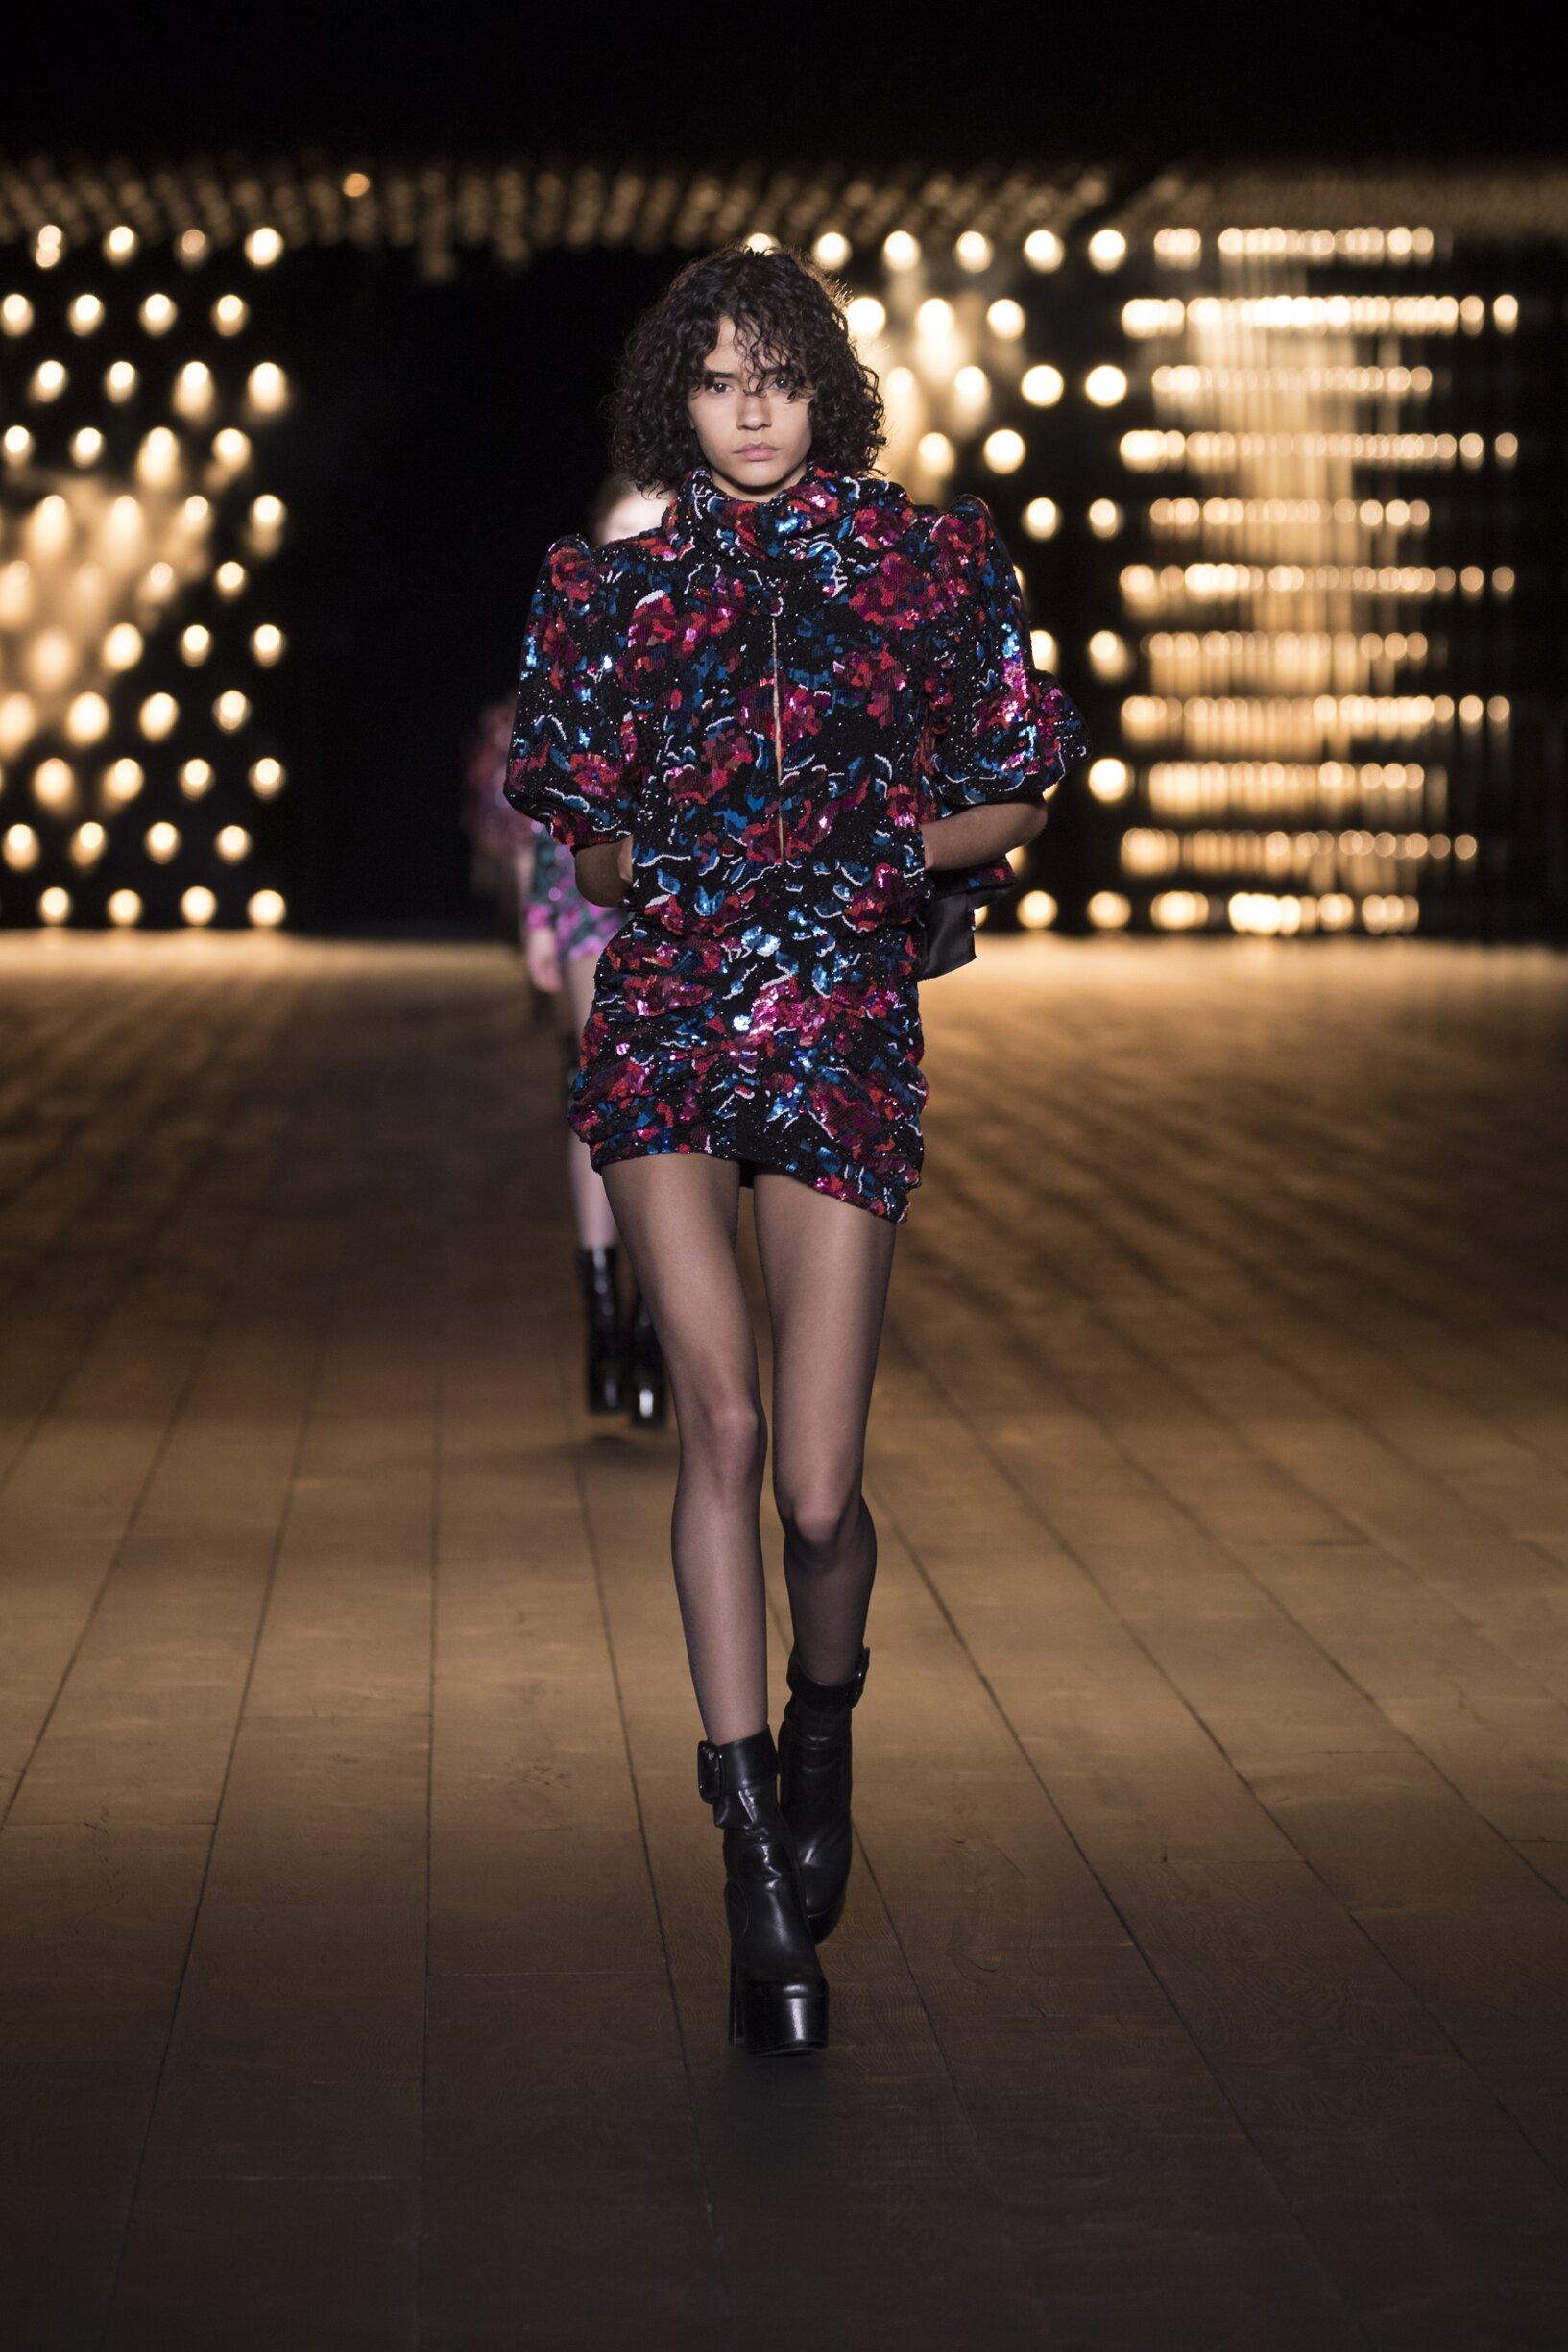 Saint Laurent Womenswear Collection Trends Winter